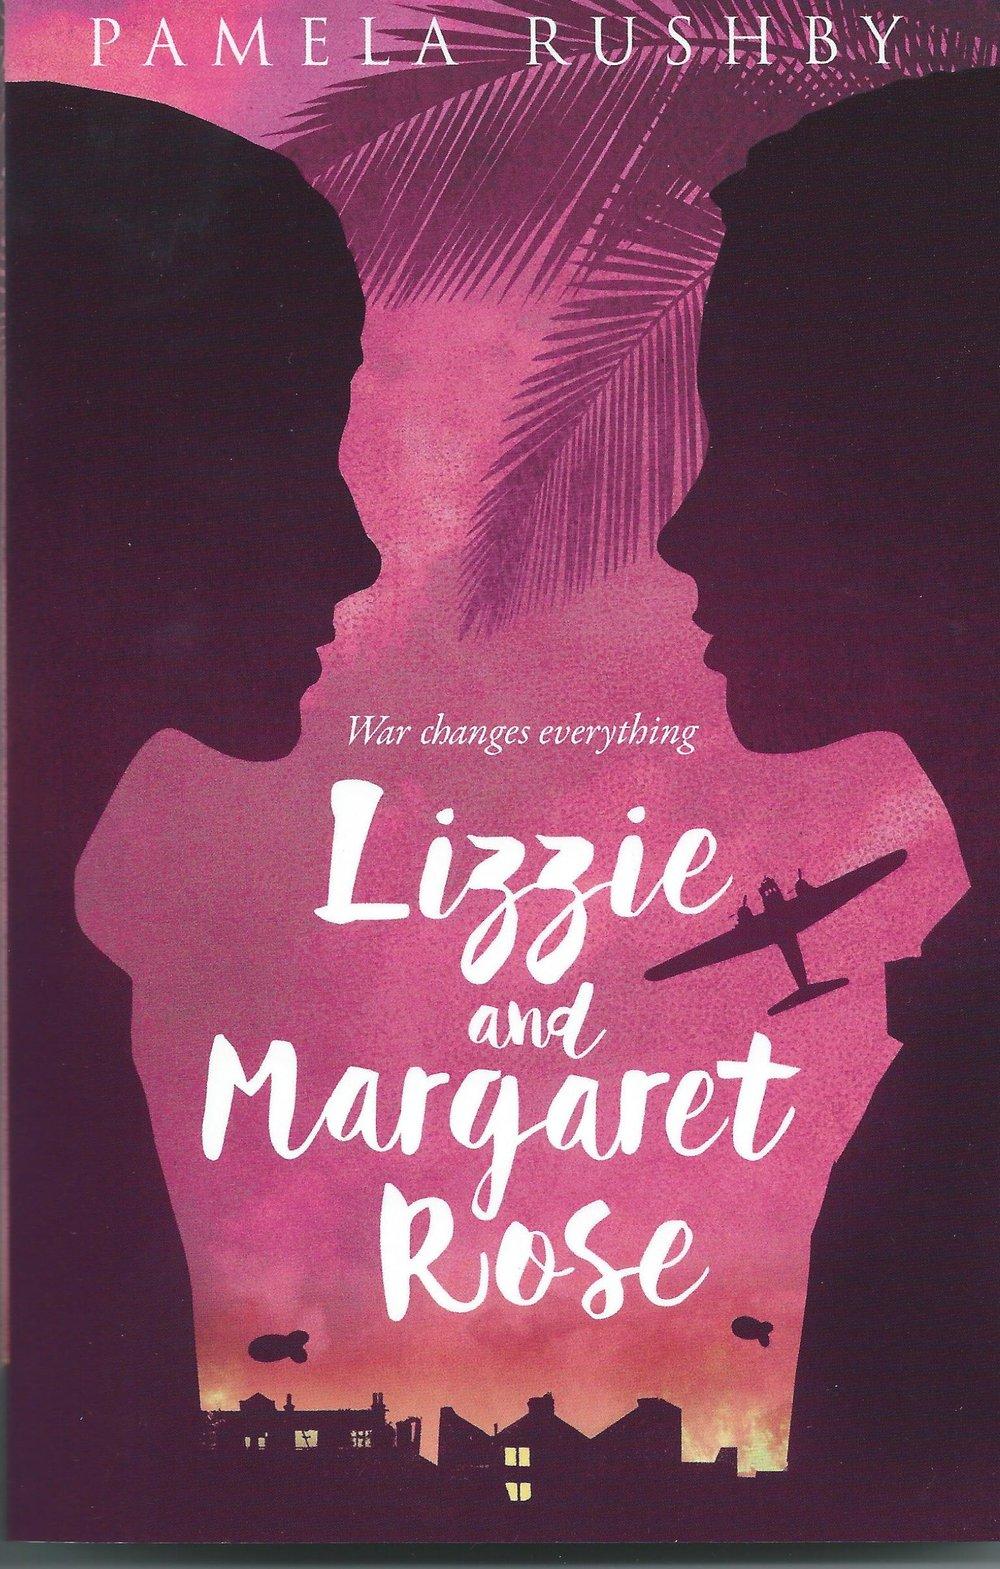 LizzieMargaretRose (1).jpg